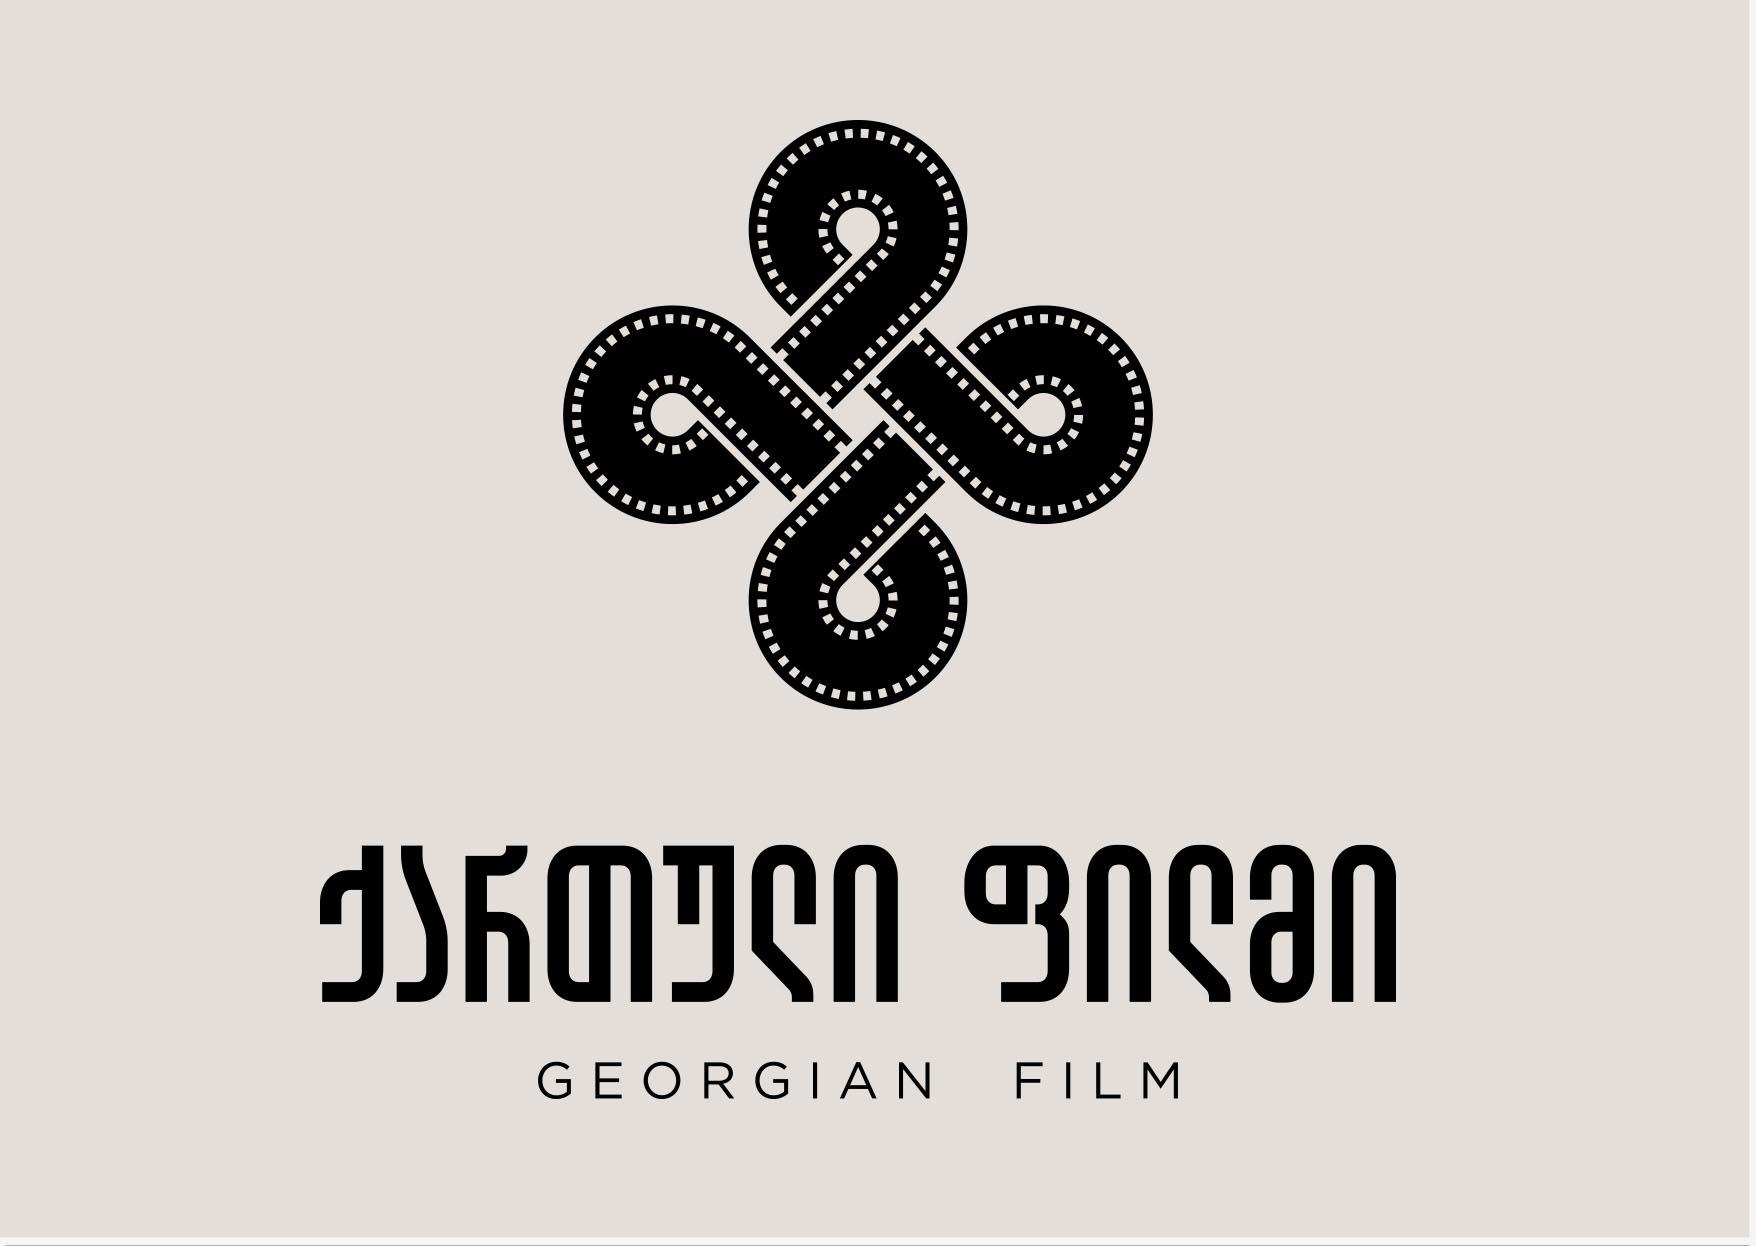 Georgian film